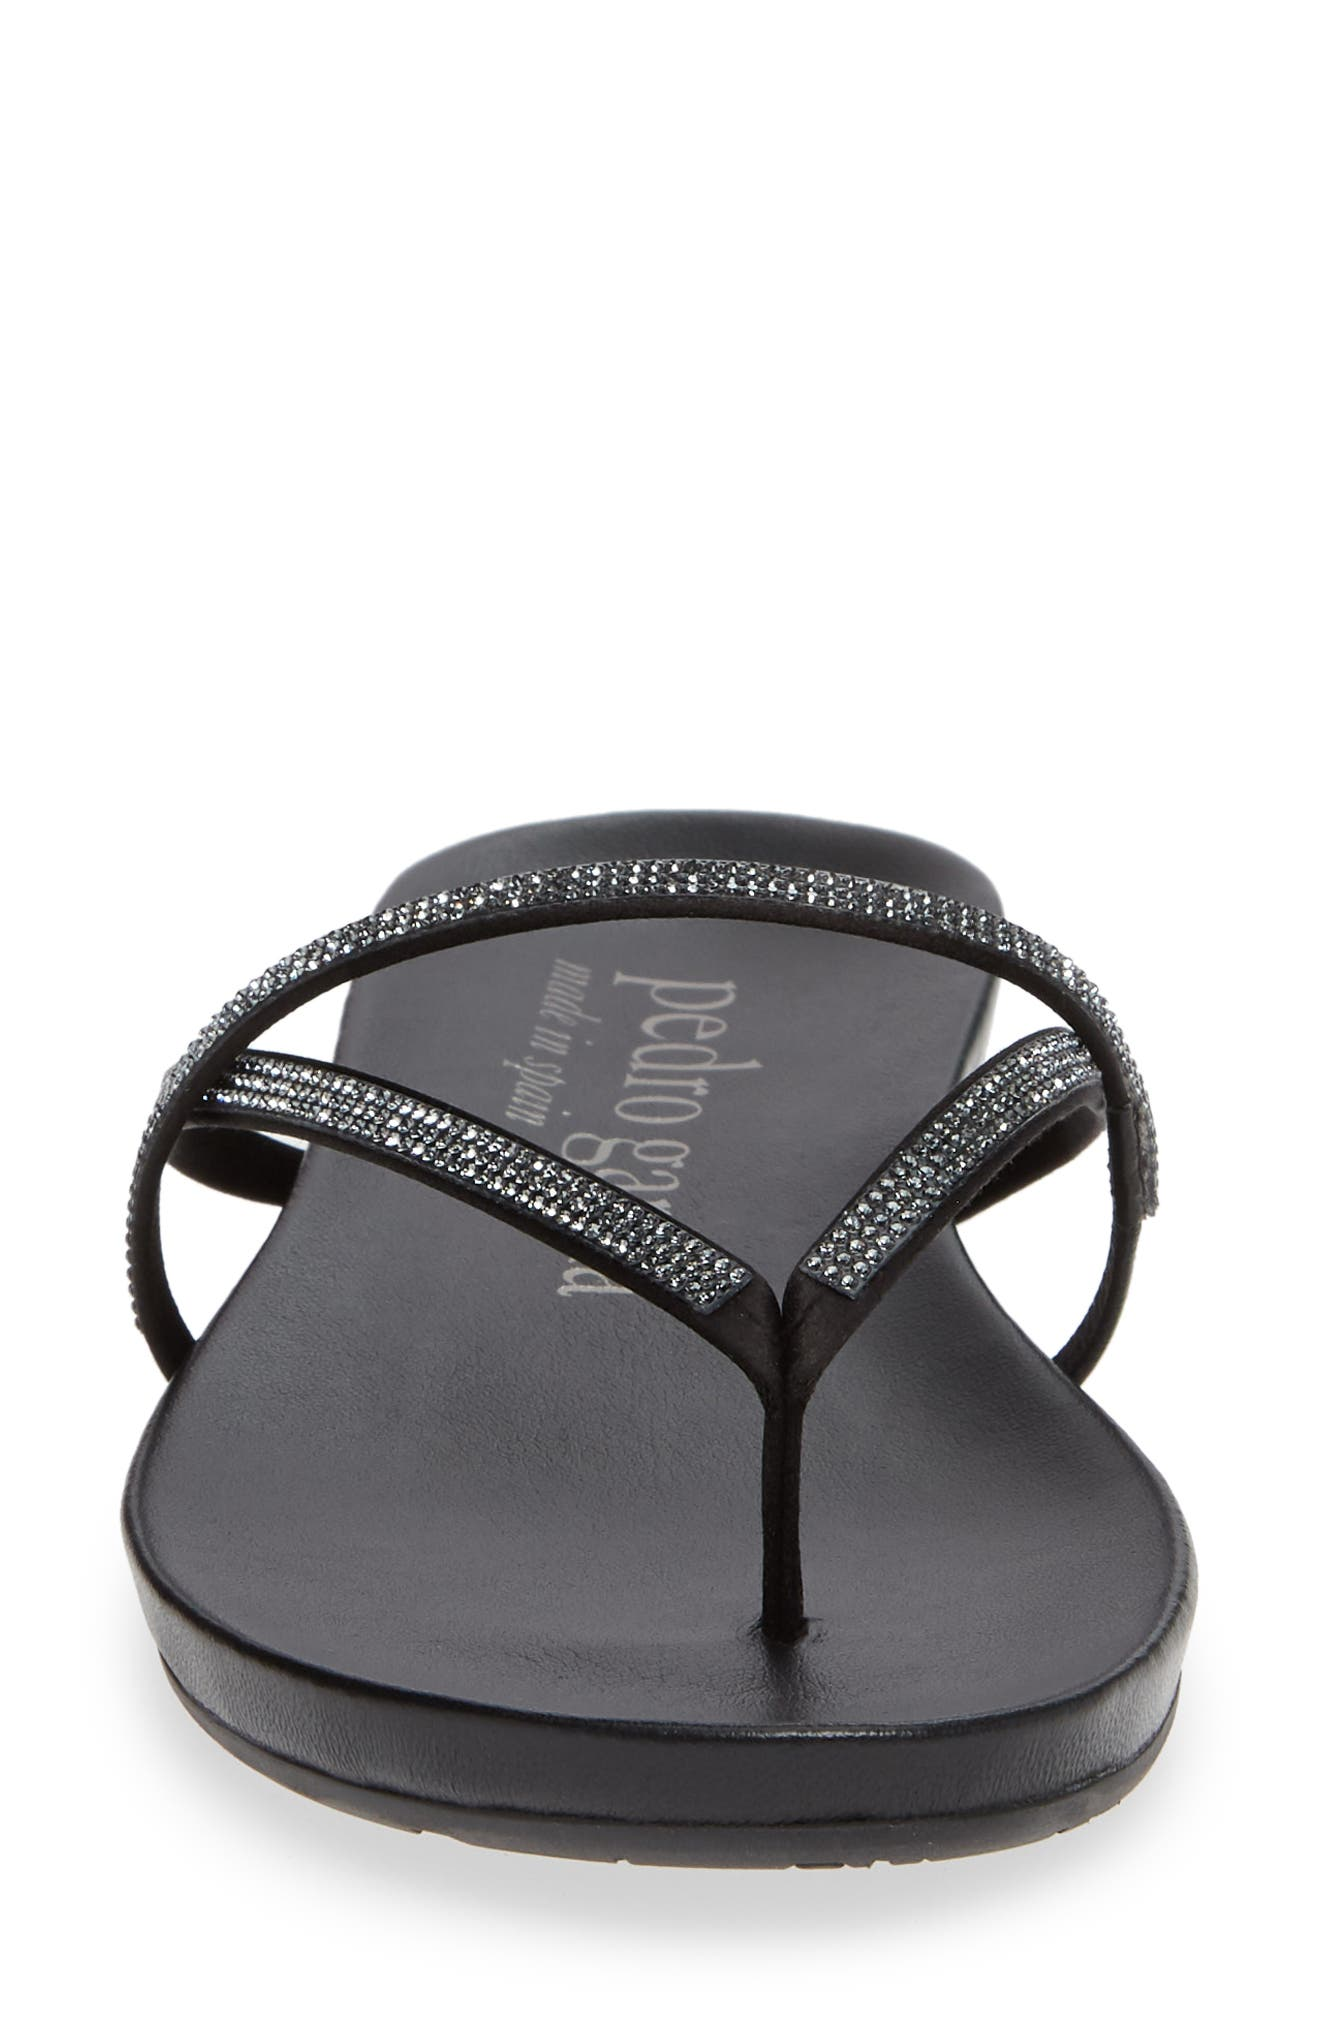 PEDRO GARCIA, Giulia Crystal Embellished Sandal, Alternate thumbnail 4, color, METEORITE SATIN